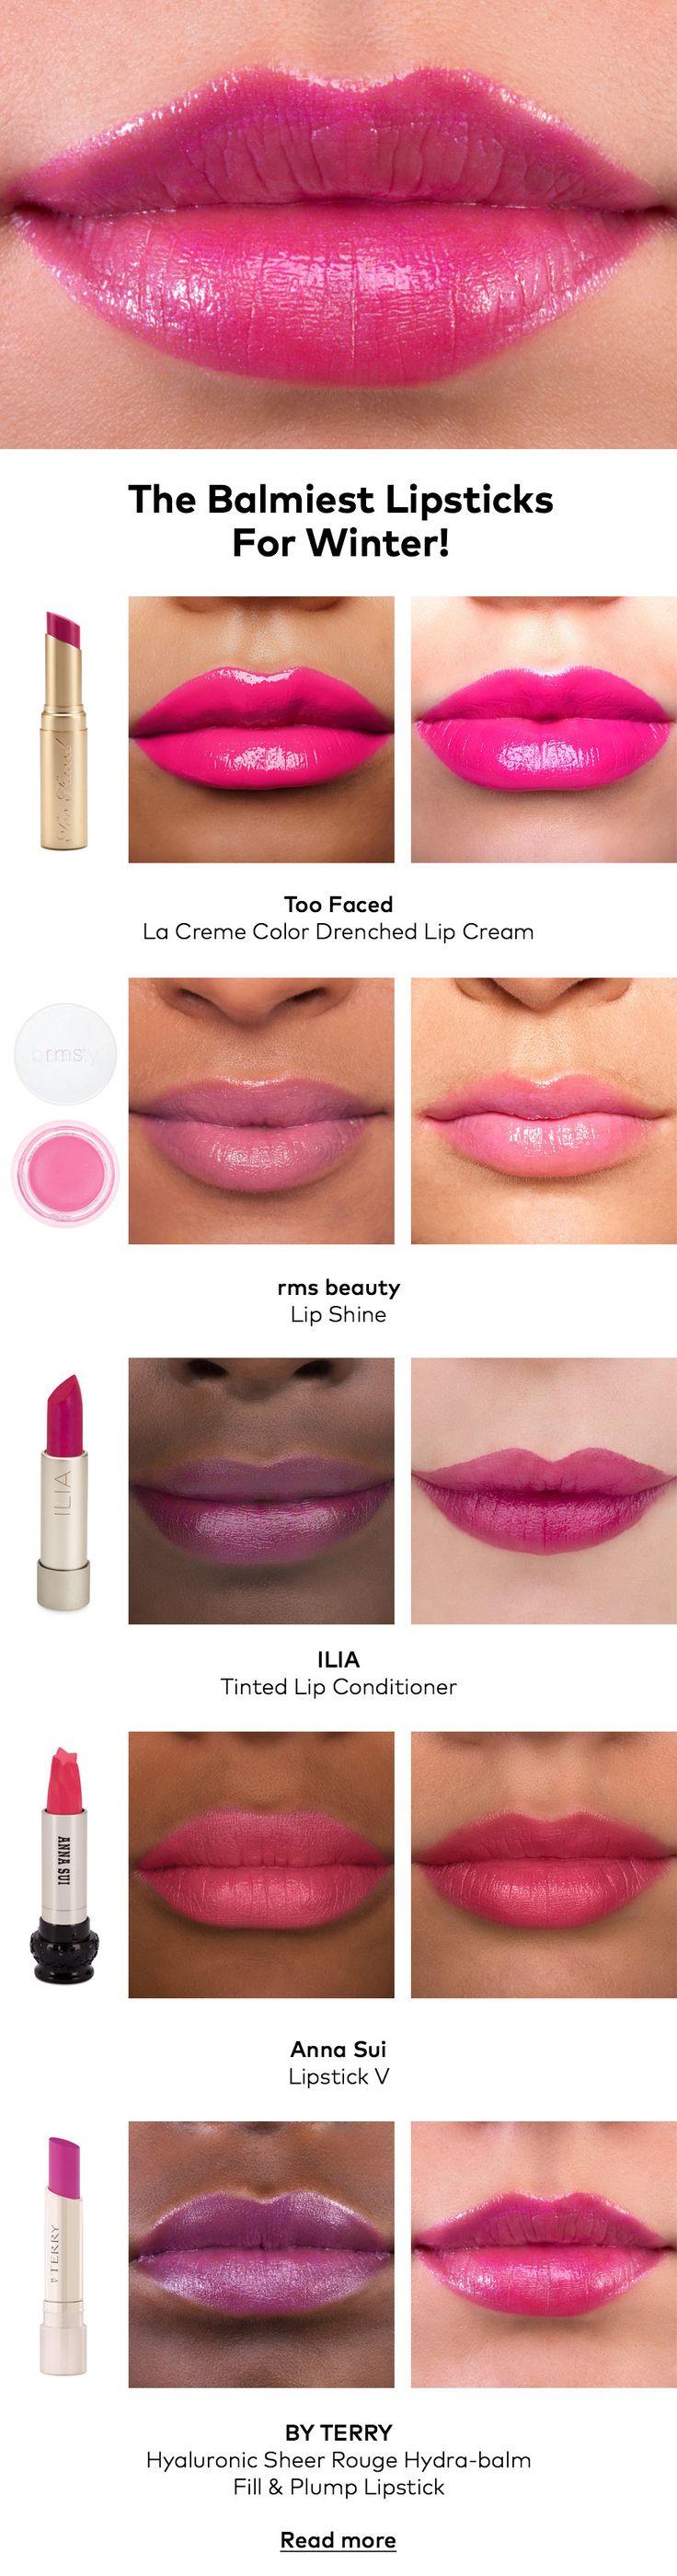 Get Hydrated! The Balmiest Lipsticks For Winter | Beautylish  I especially like the Ilia Lip Conditioner.